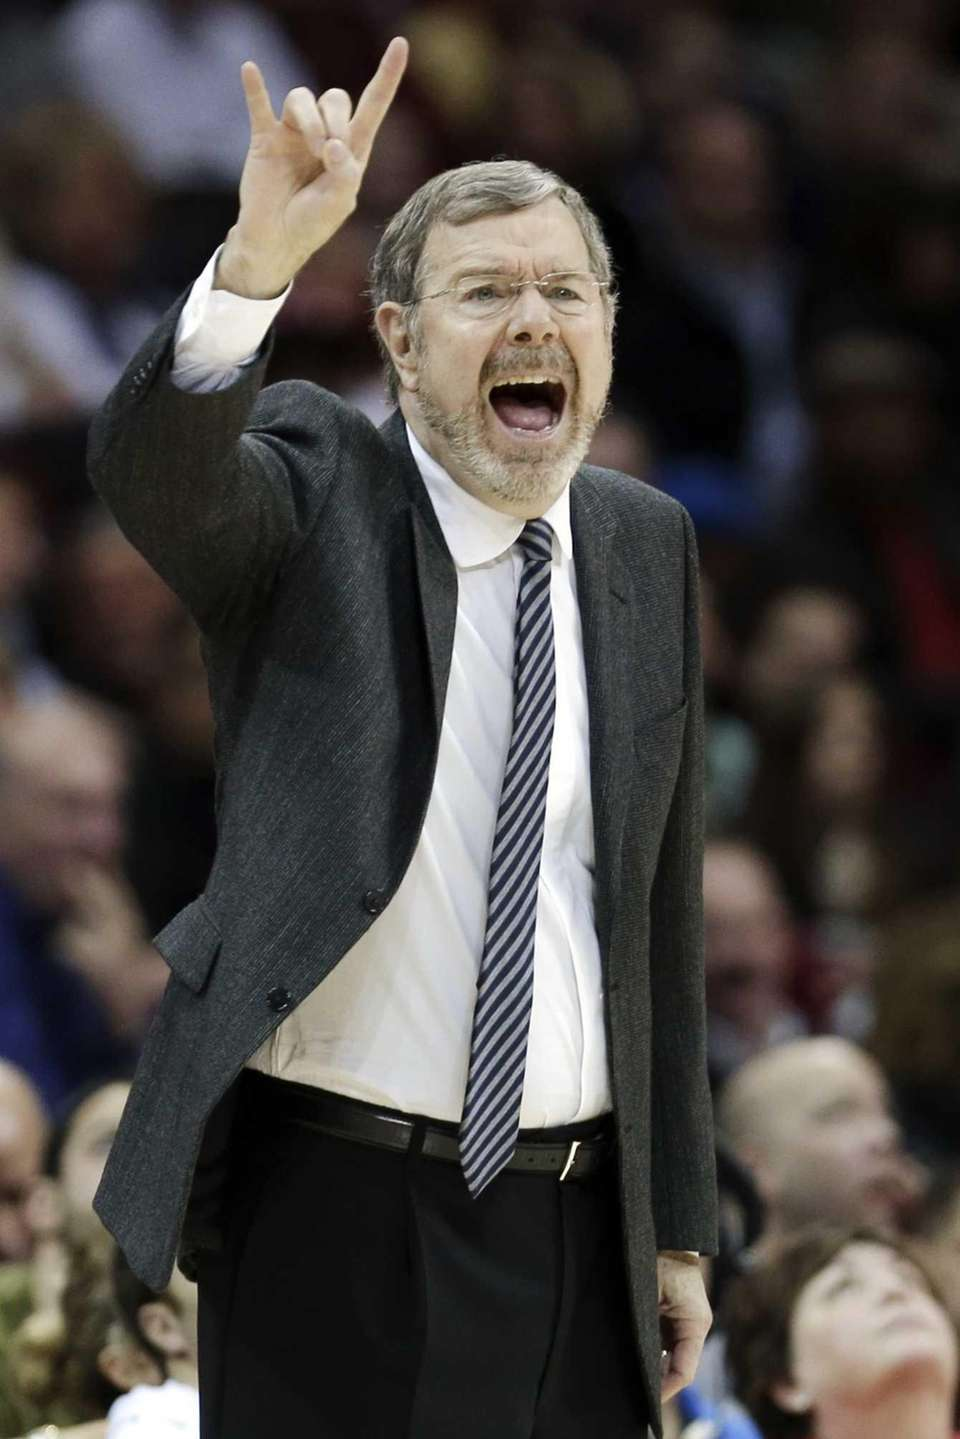 Nets interim head coach P.J. Carlesimo reacts during